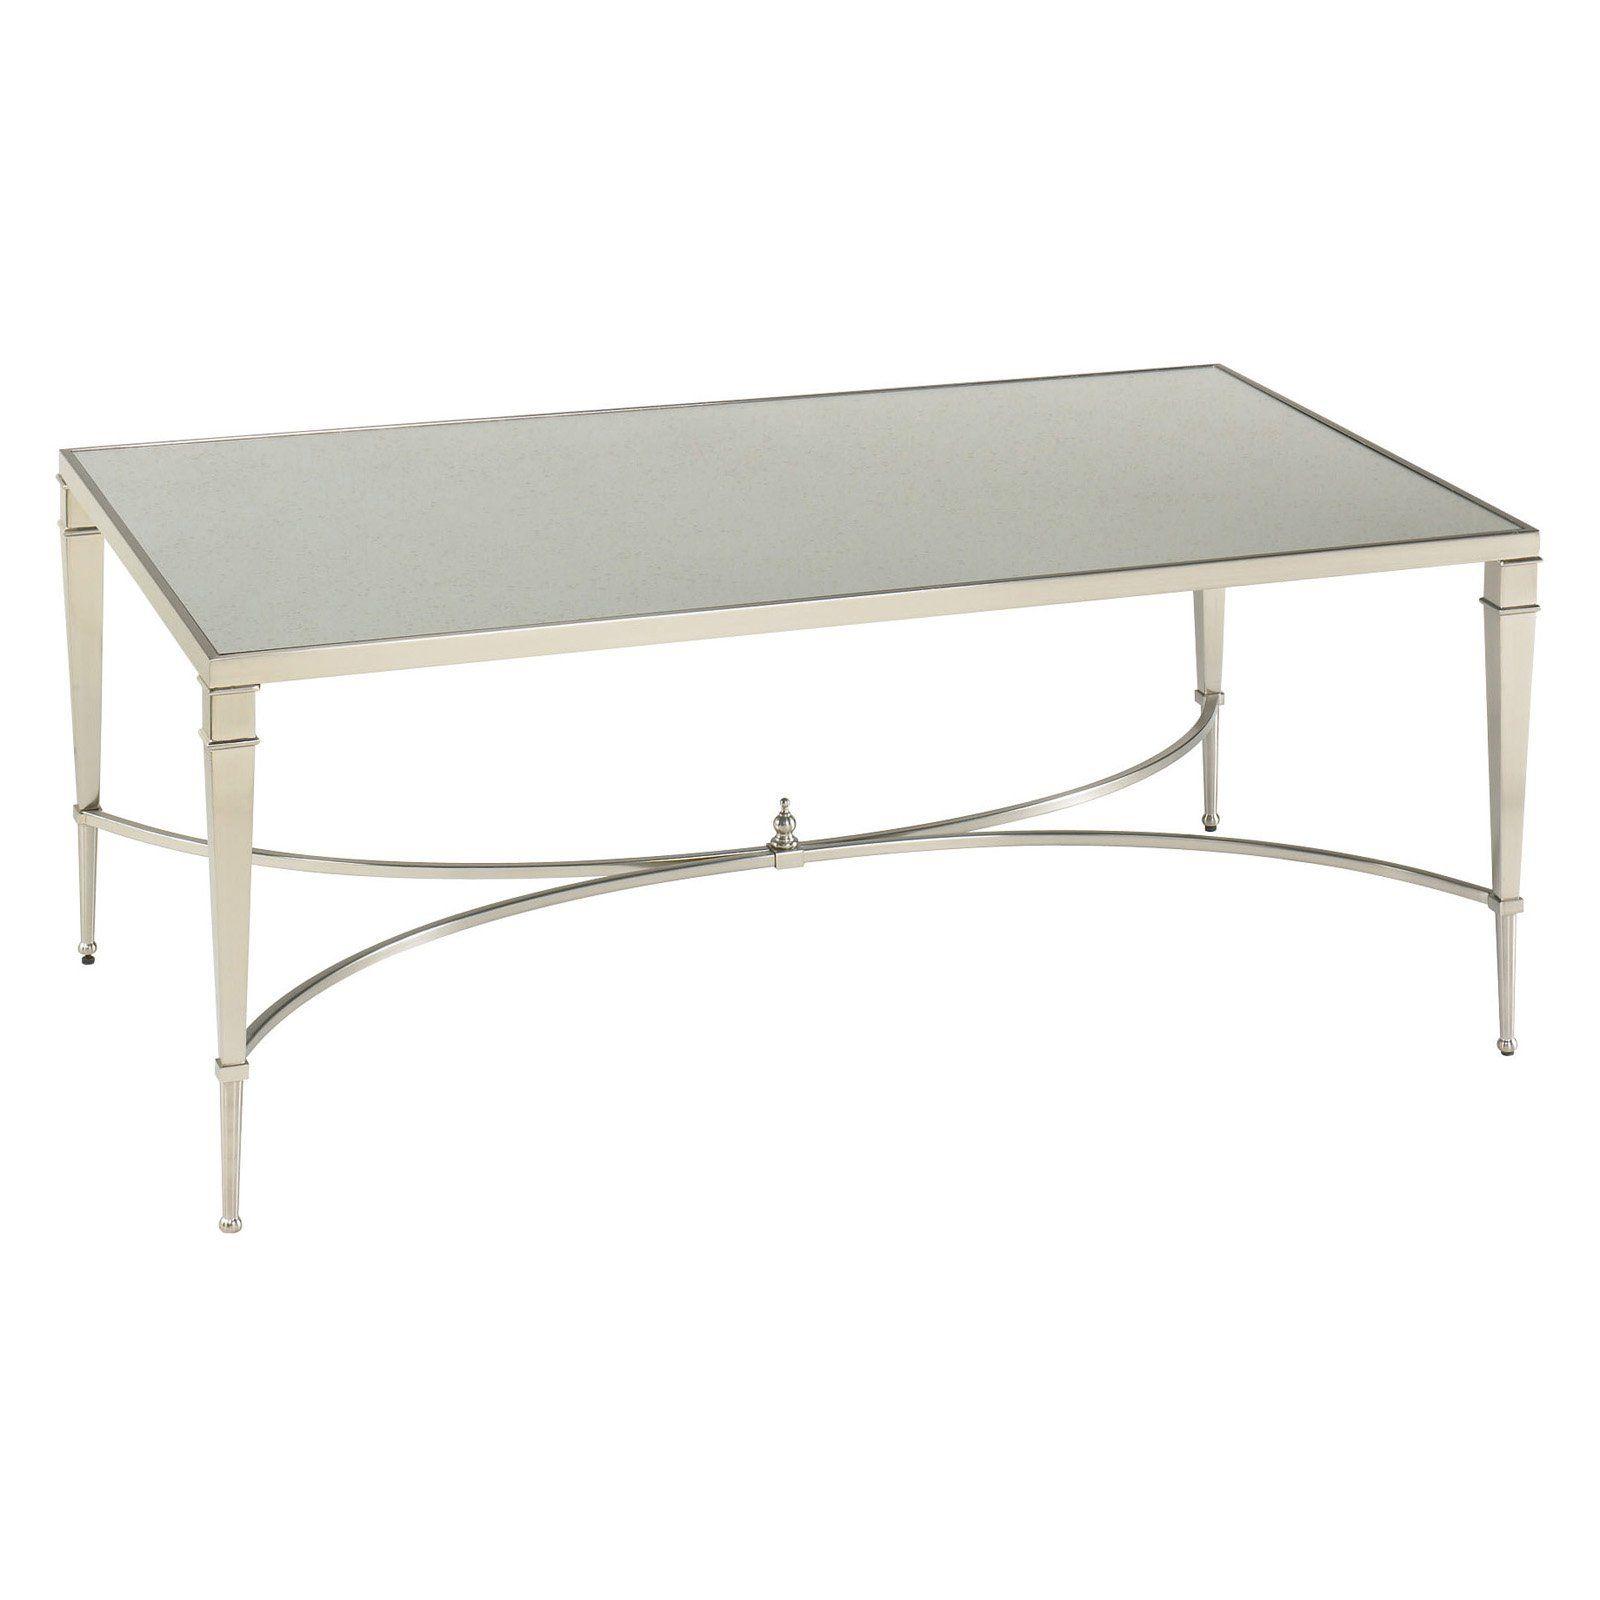 $450 Hayneedle Hammary Mallory Rectangular Coffee Table The